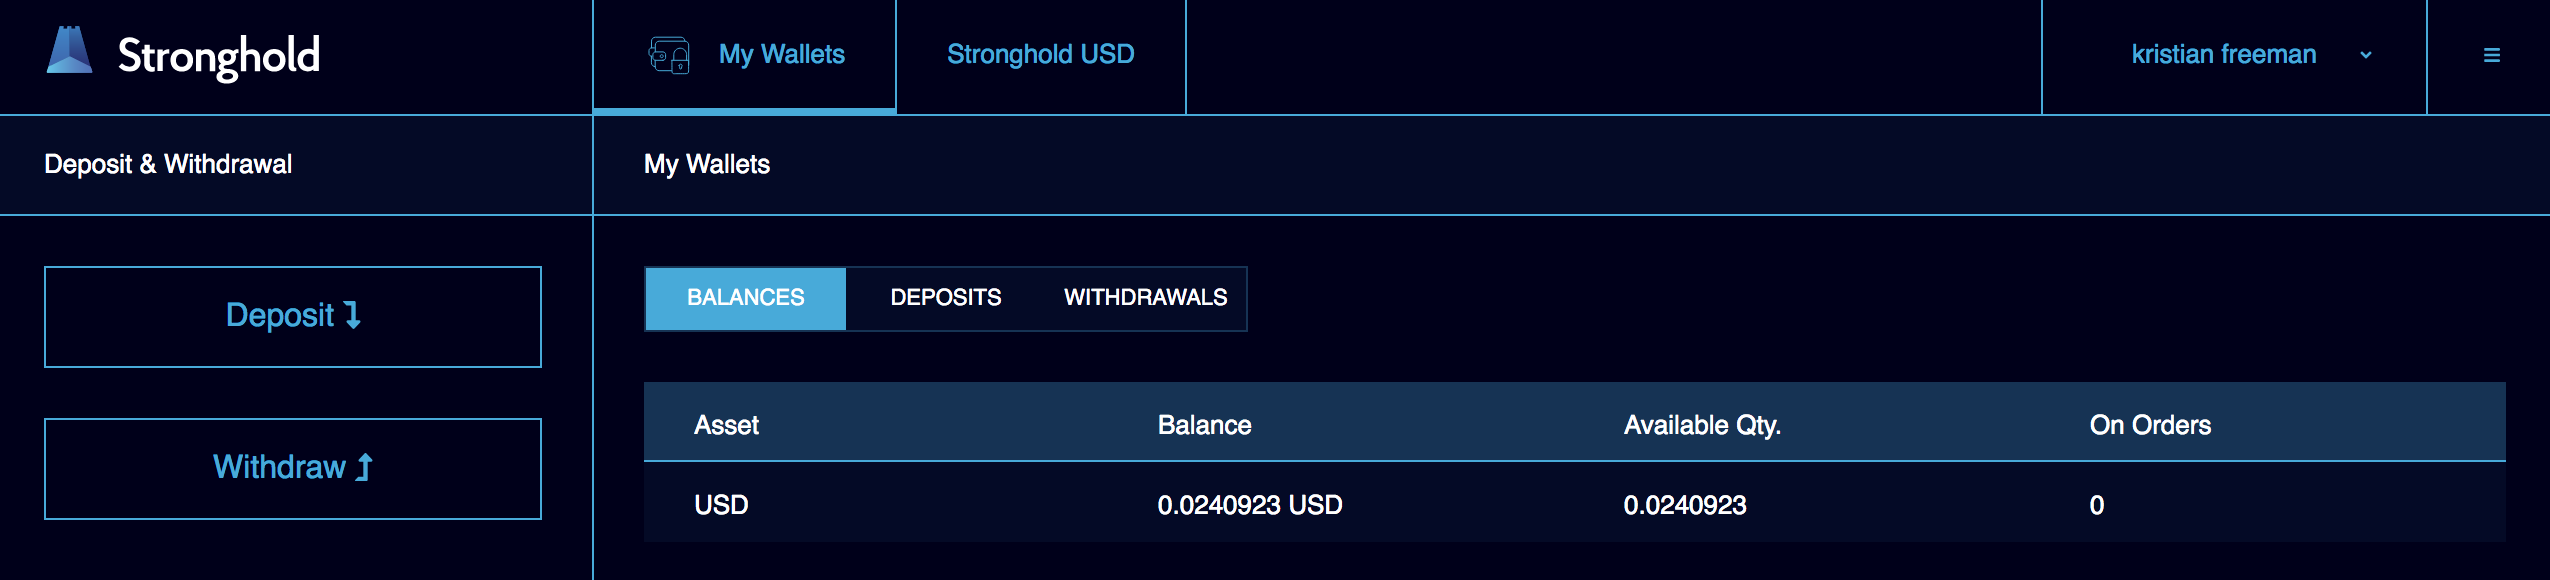 My first Web Monetization deposit